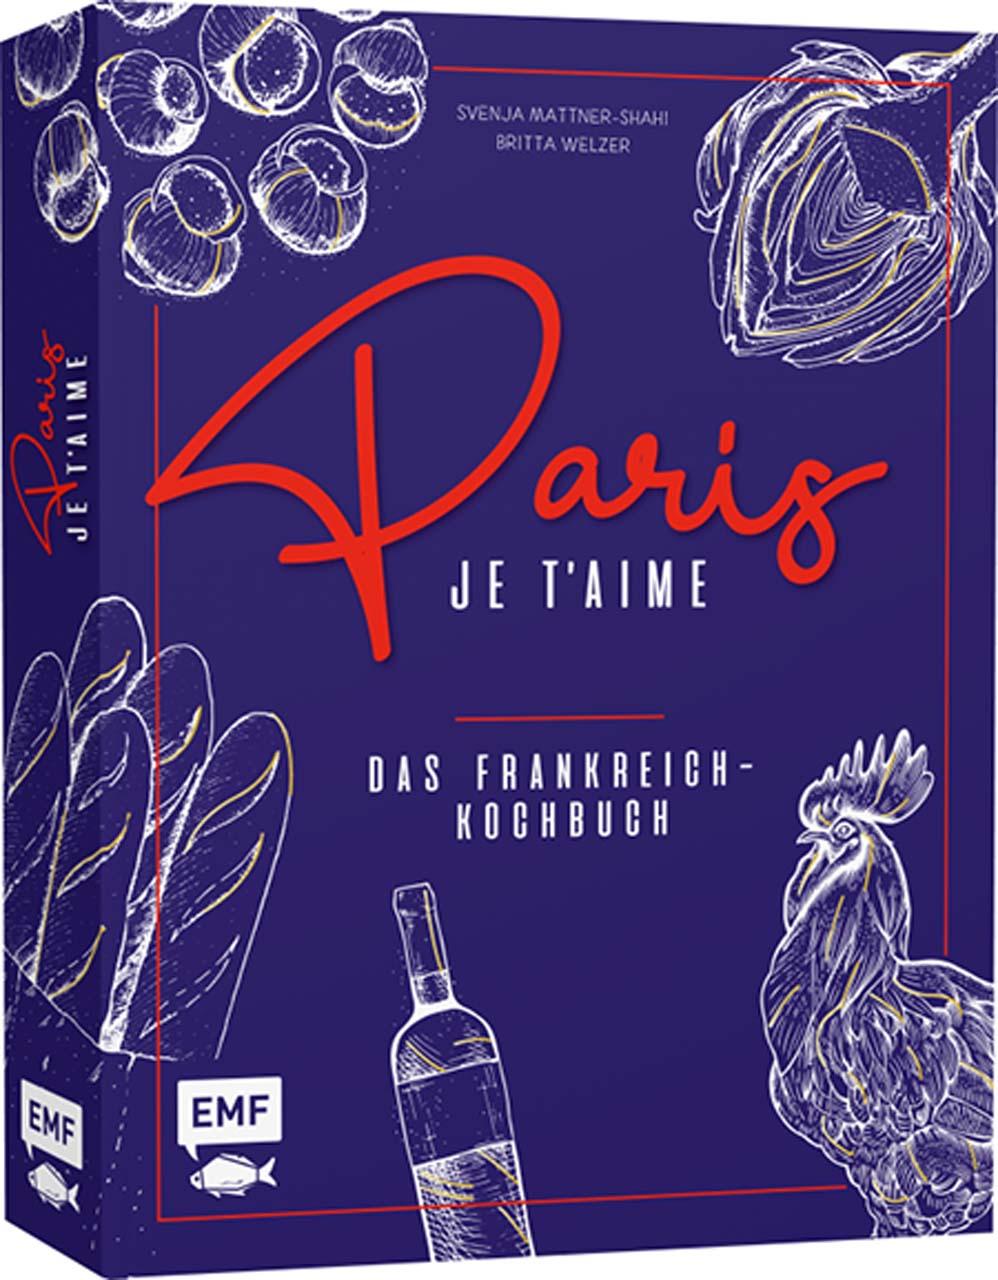 Buchtipp – Welzer/Mattner-Shahi: Paris je 'taime